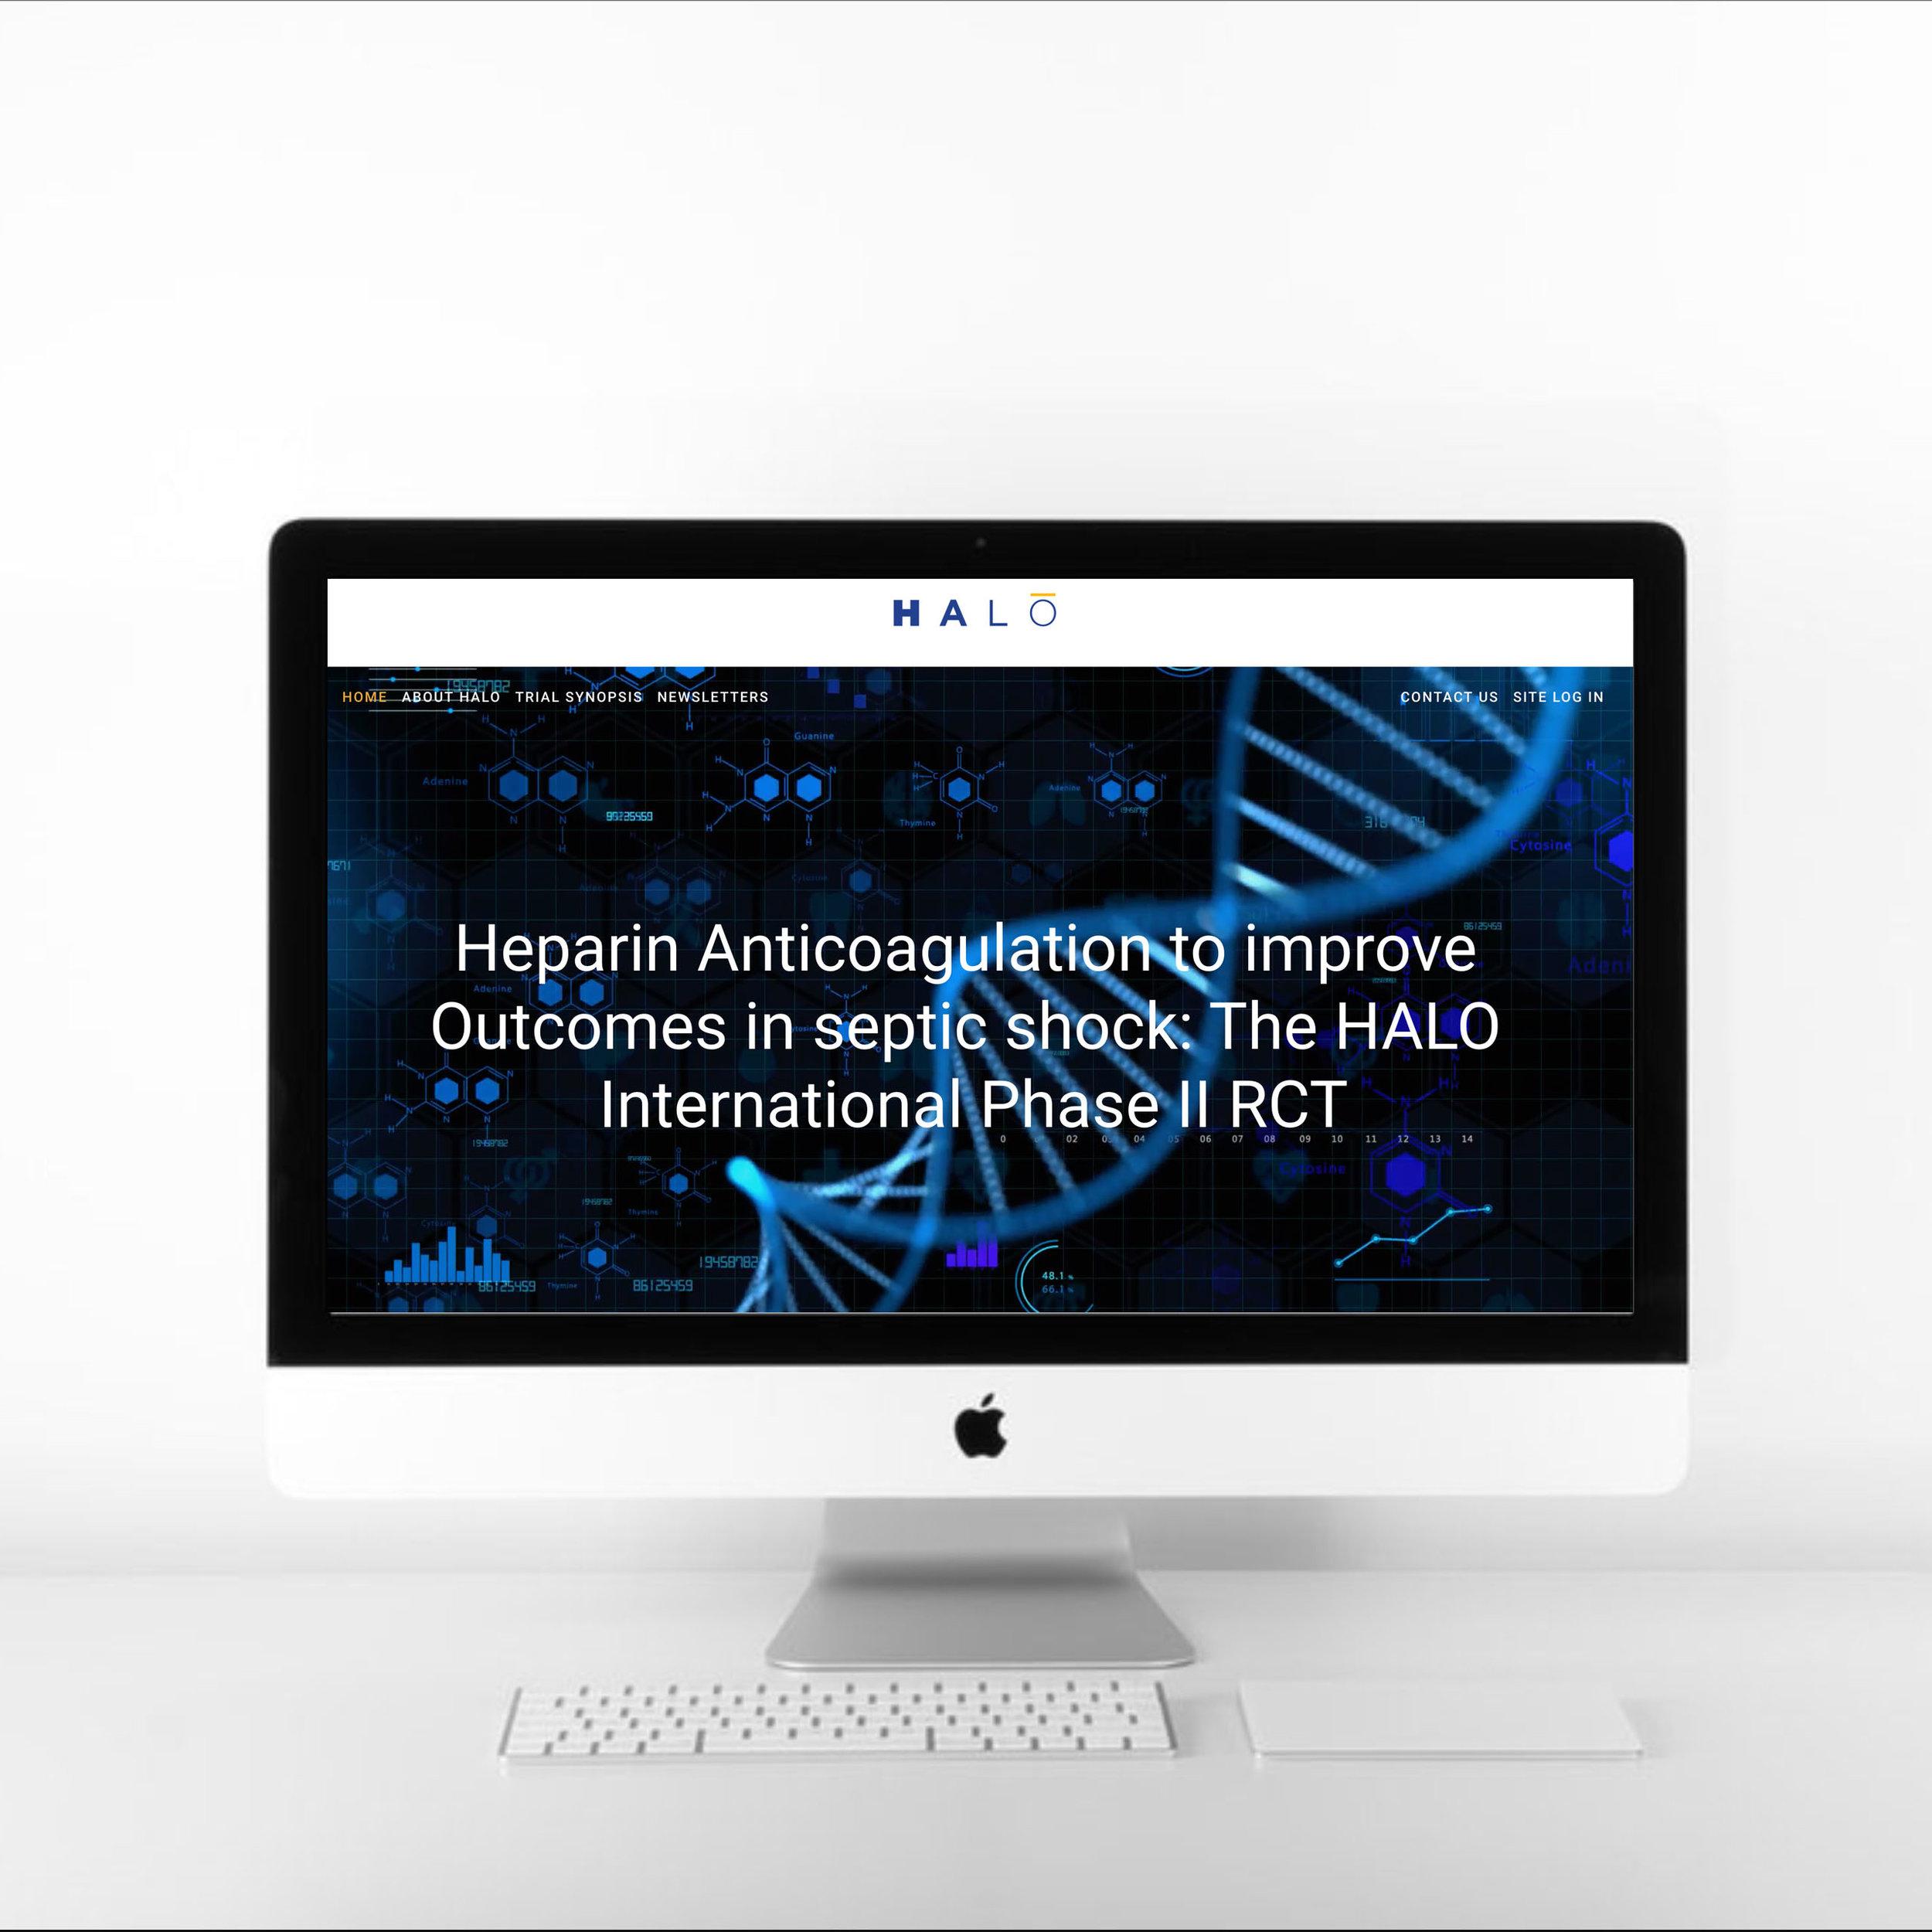 halo website.jpg